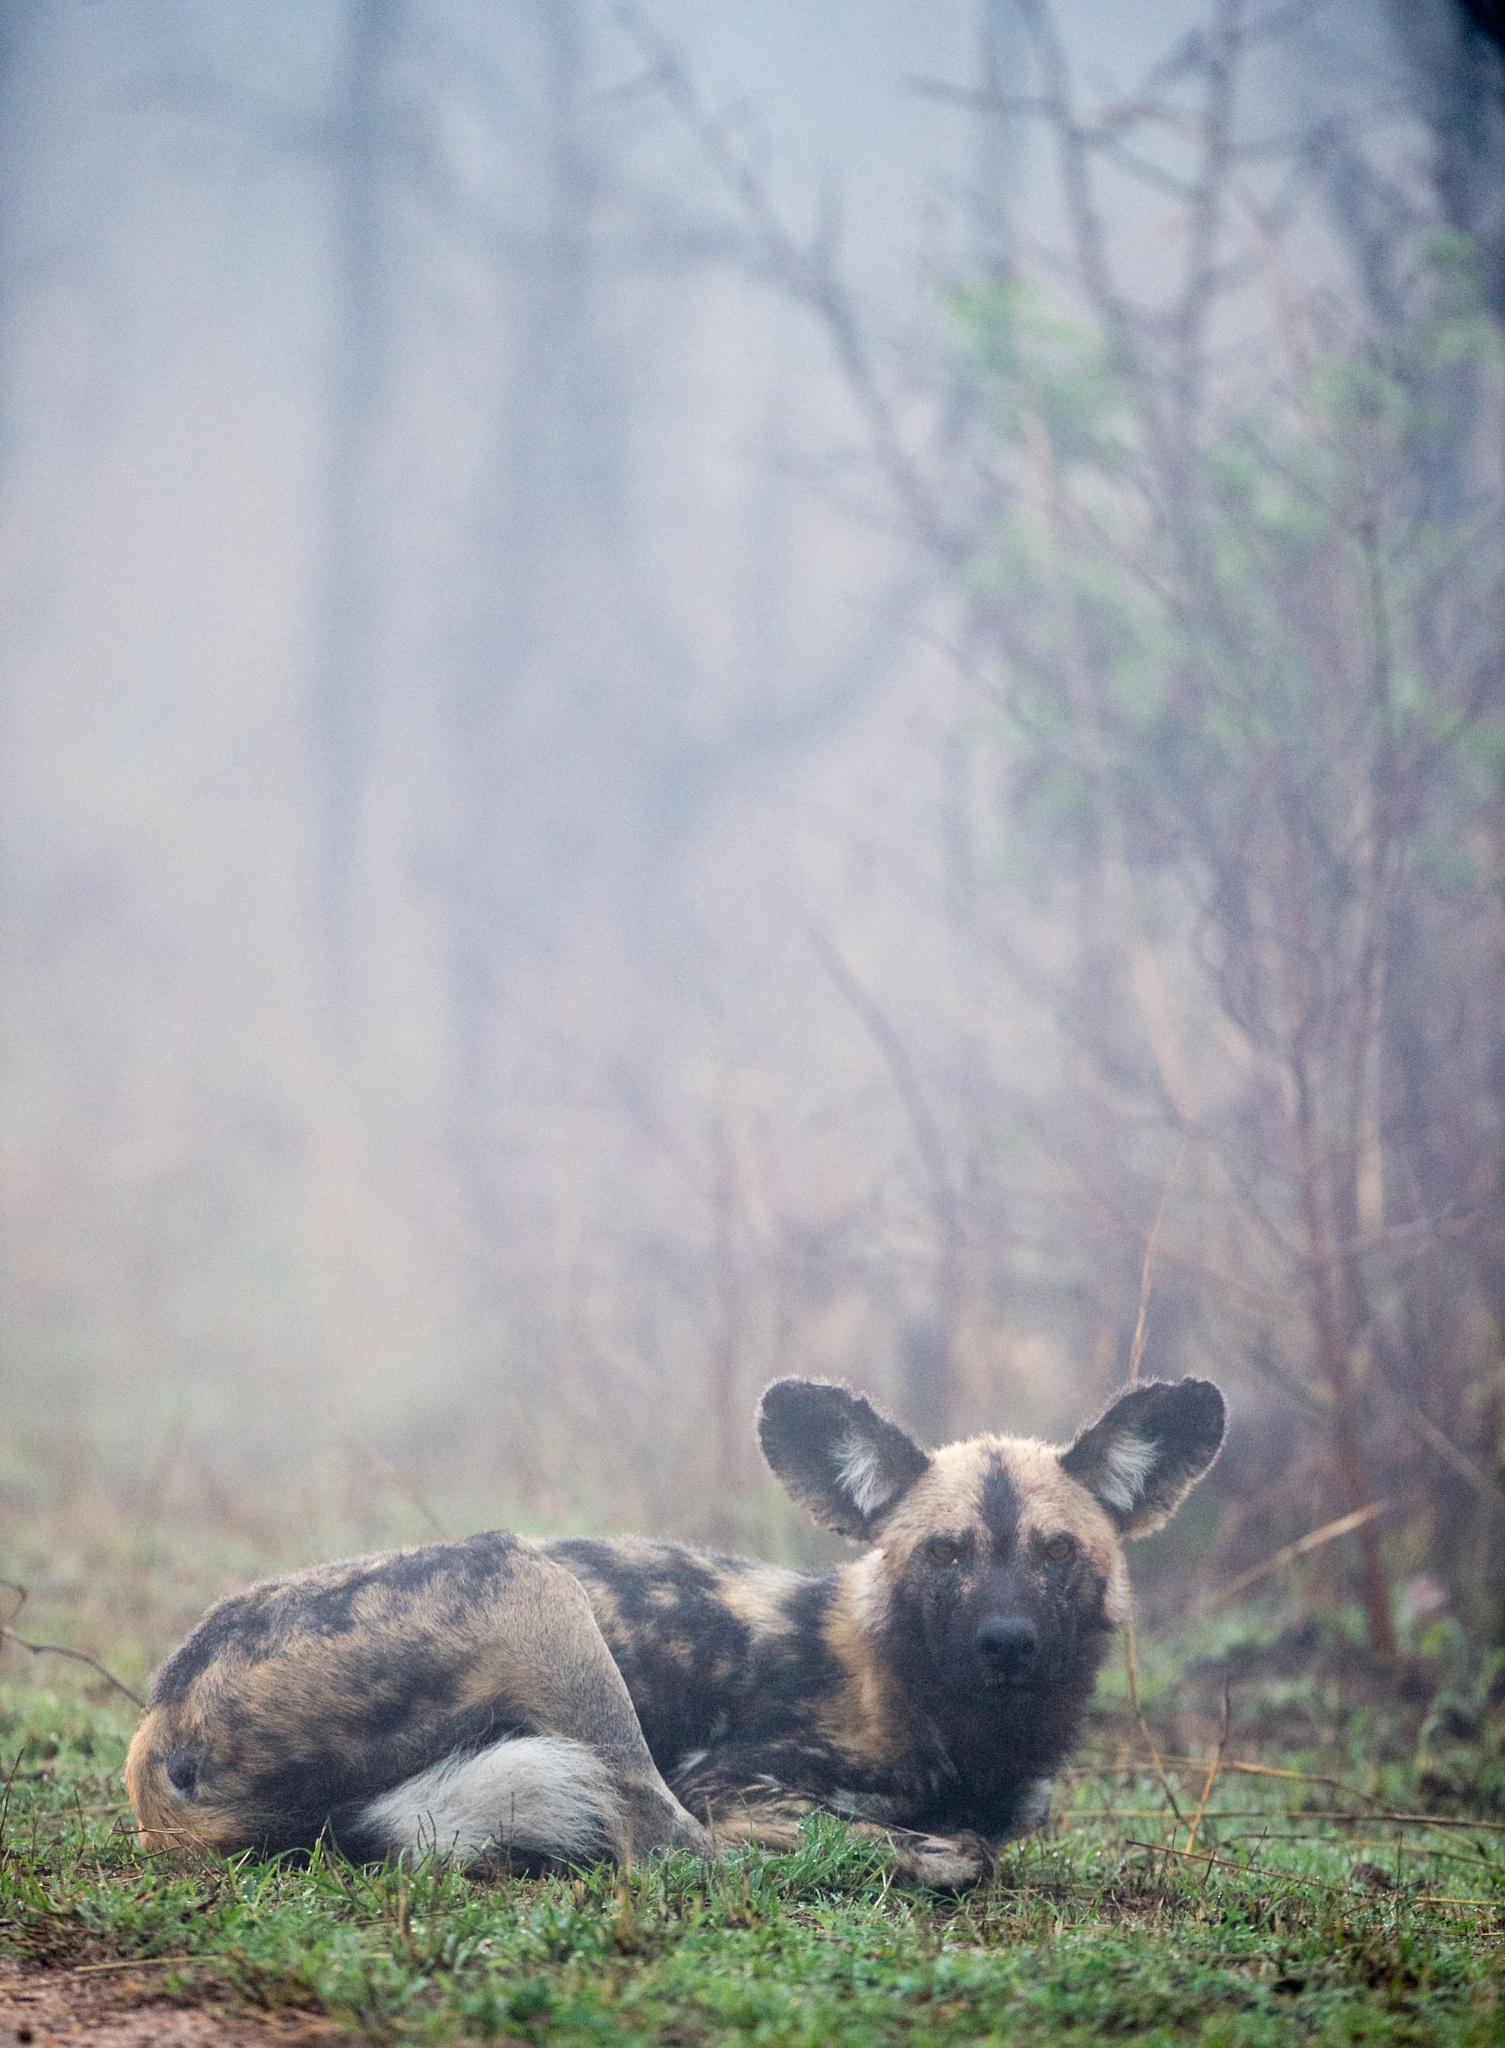 Dog in the mist by Bridgena Barnard